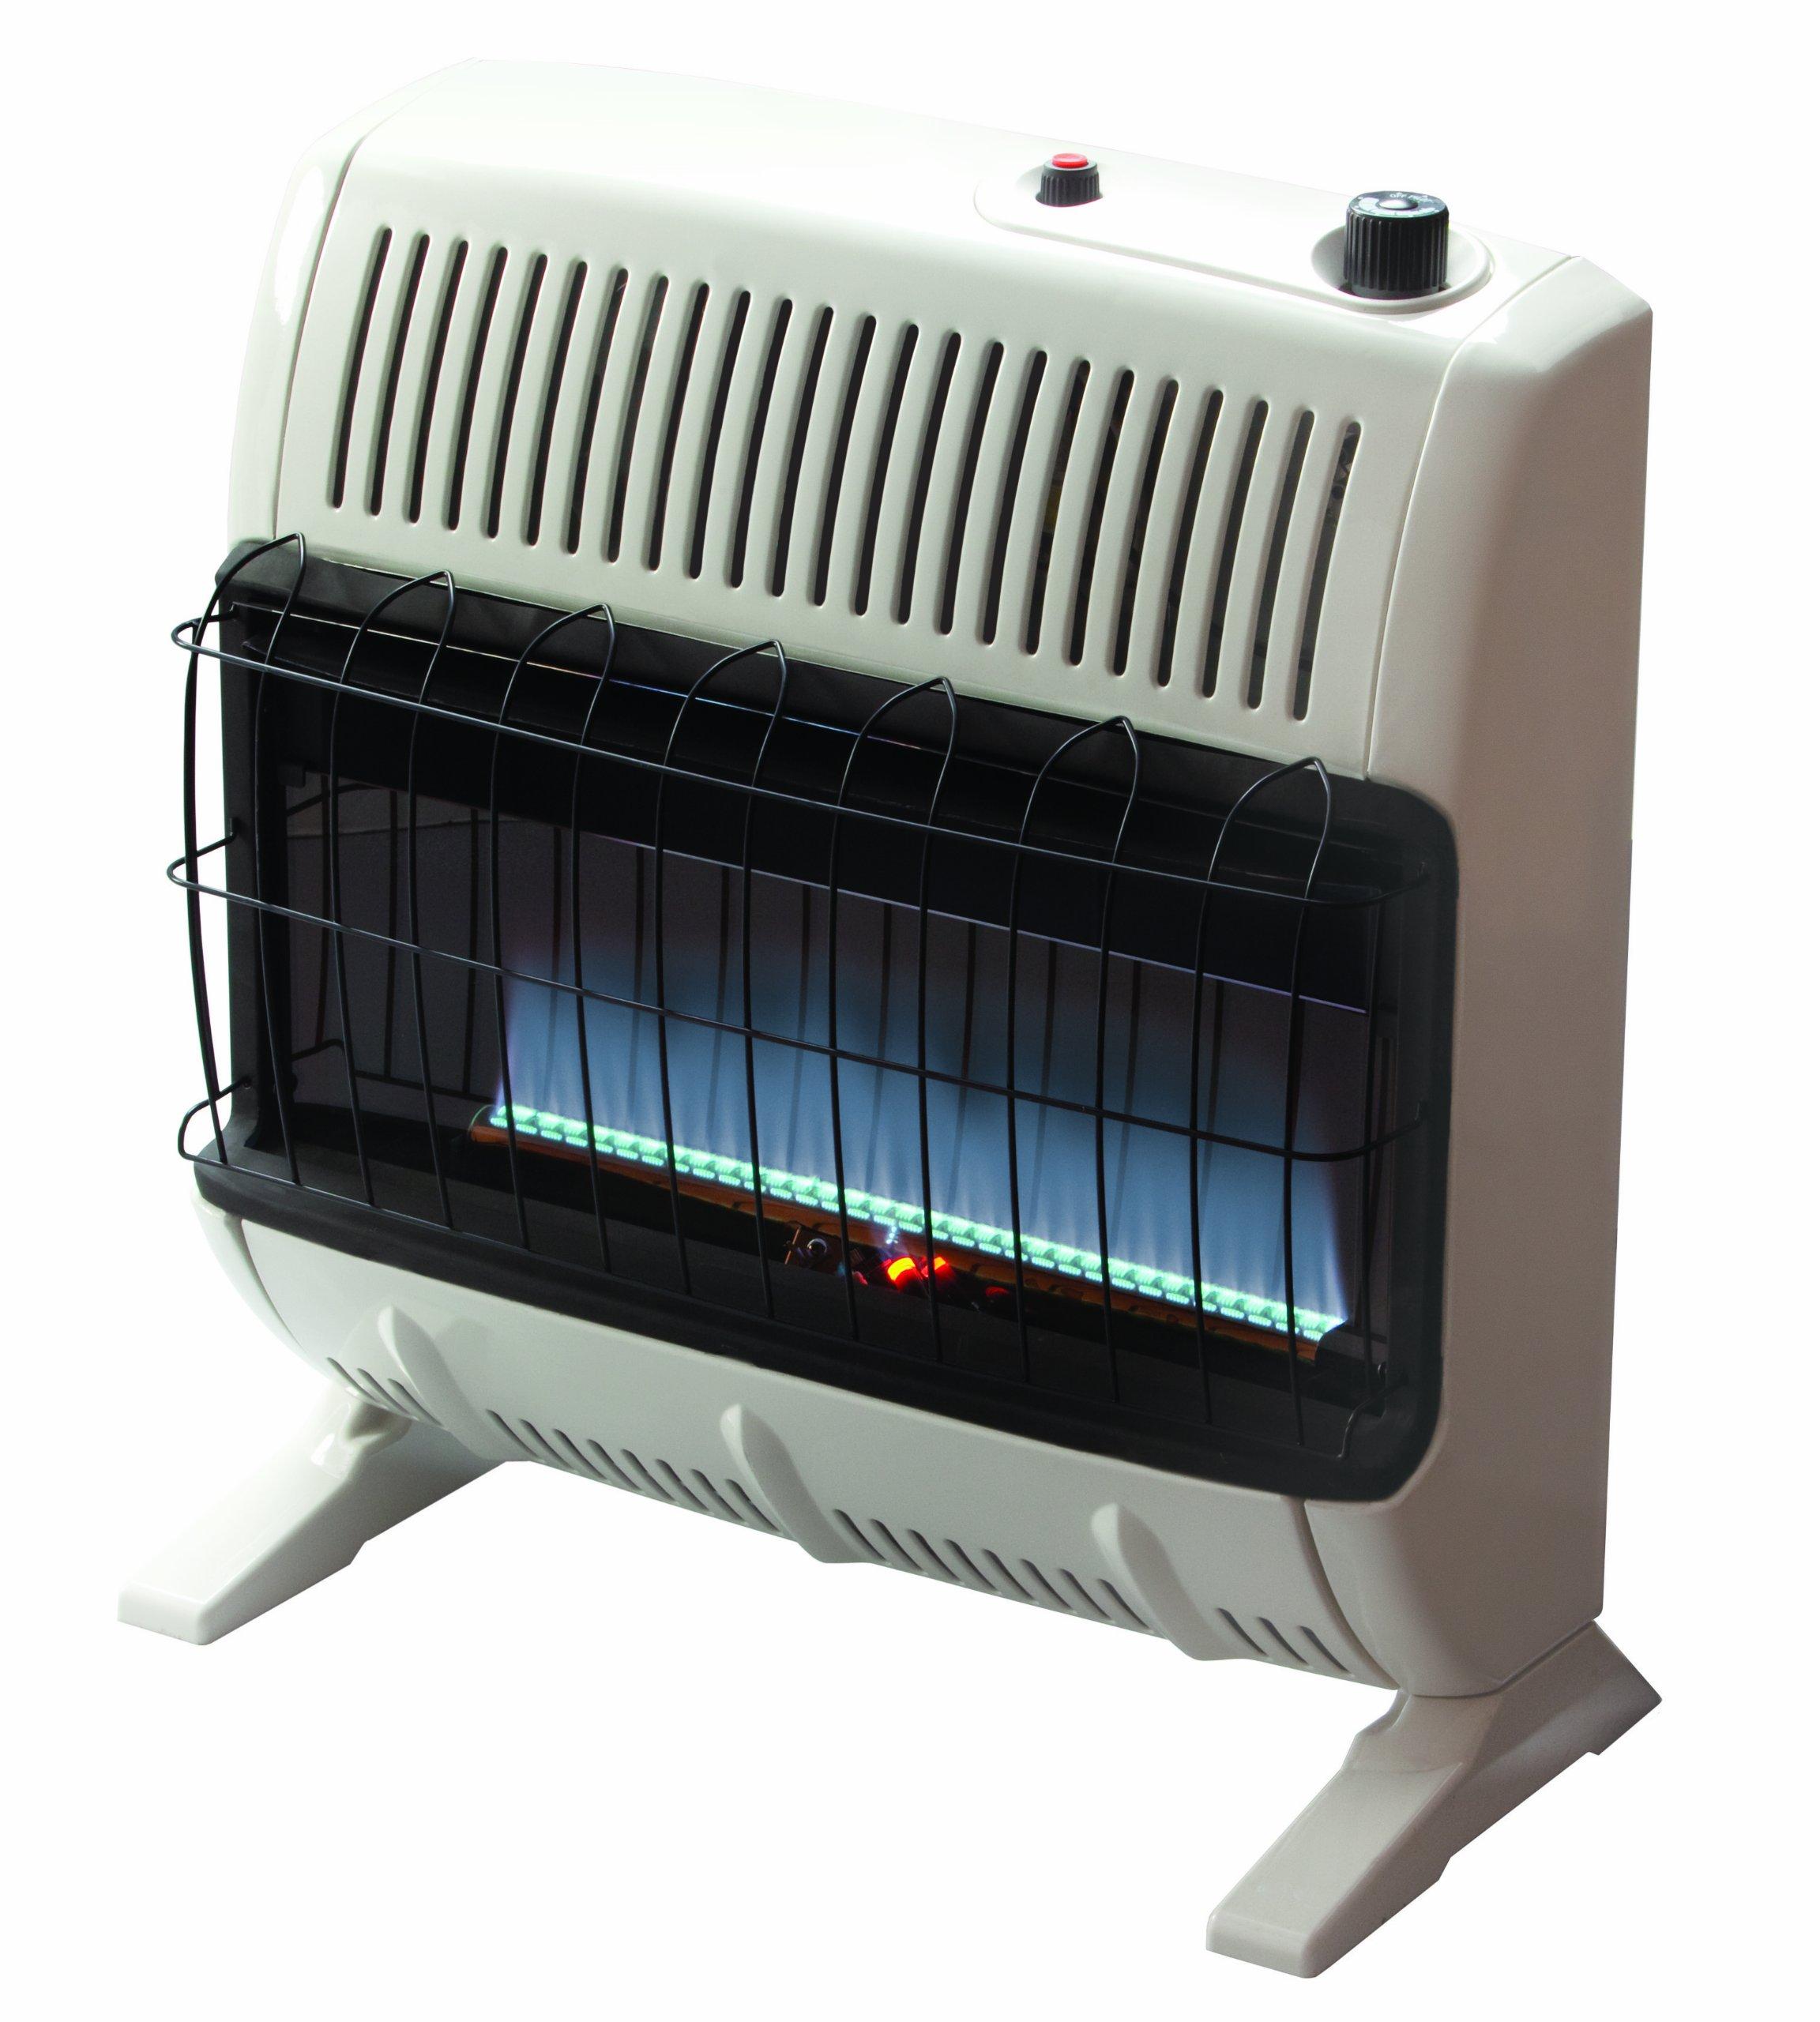 Mr. Heater 30,000 BTU Propane Blue Flame Vent-Free Heater, VF30KBLUELP by Mr. Heater